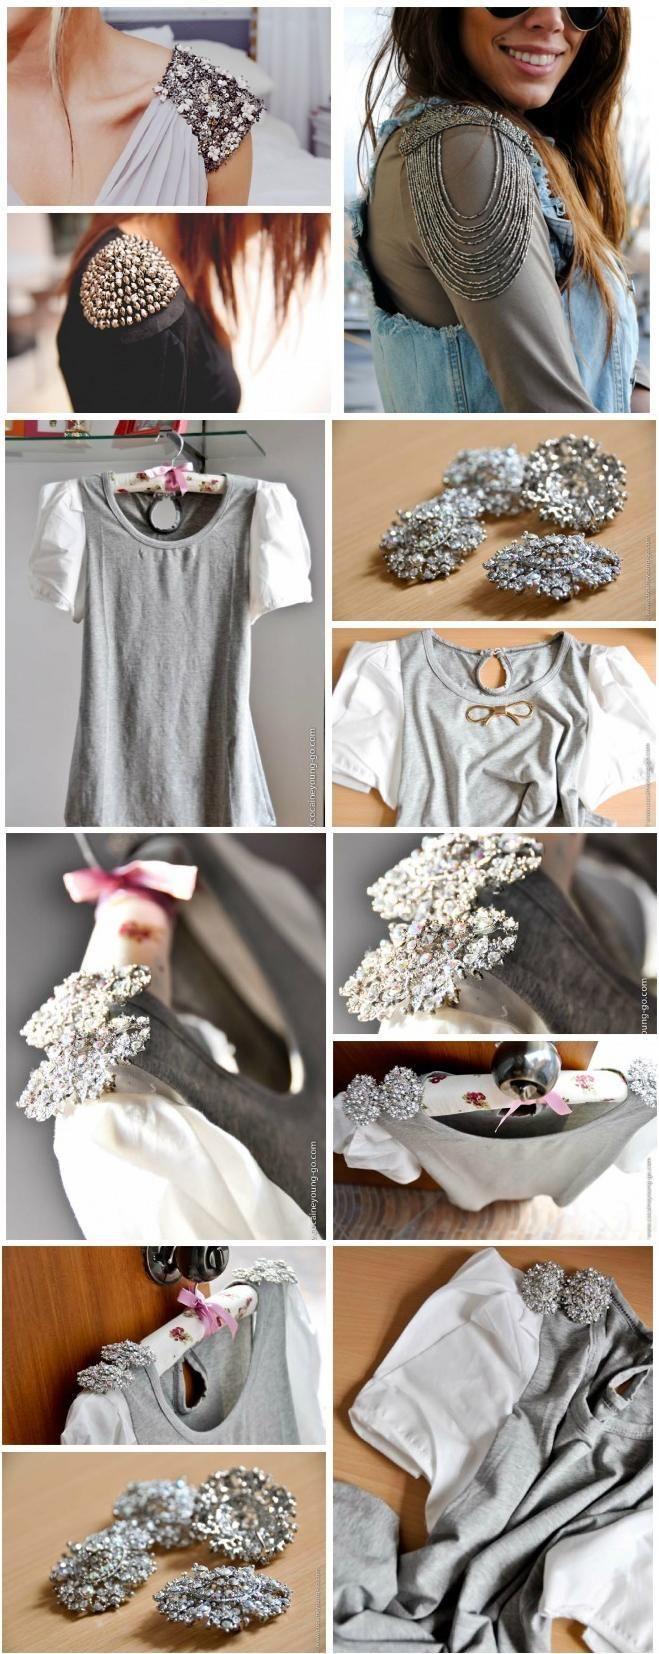 Top Trendy DIY: Embellished Shoulders